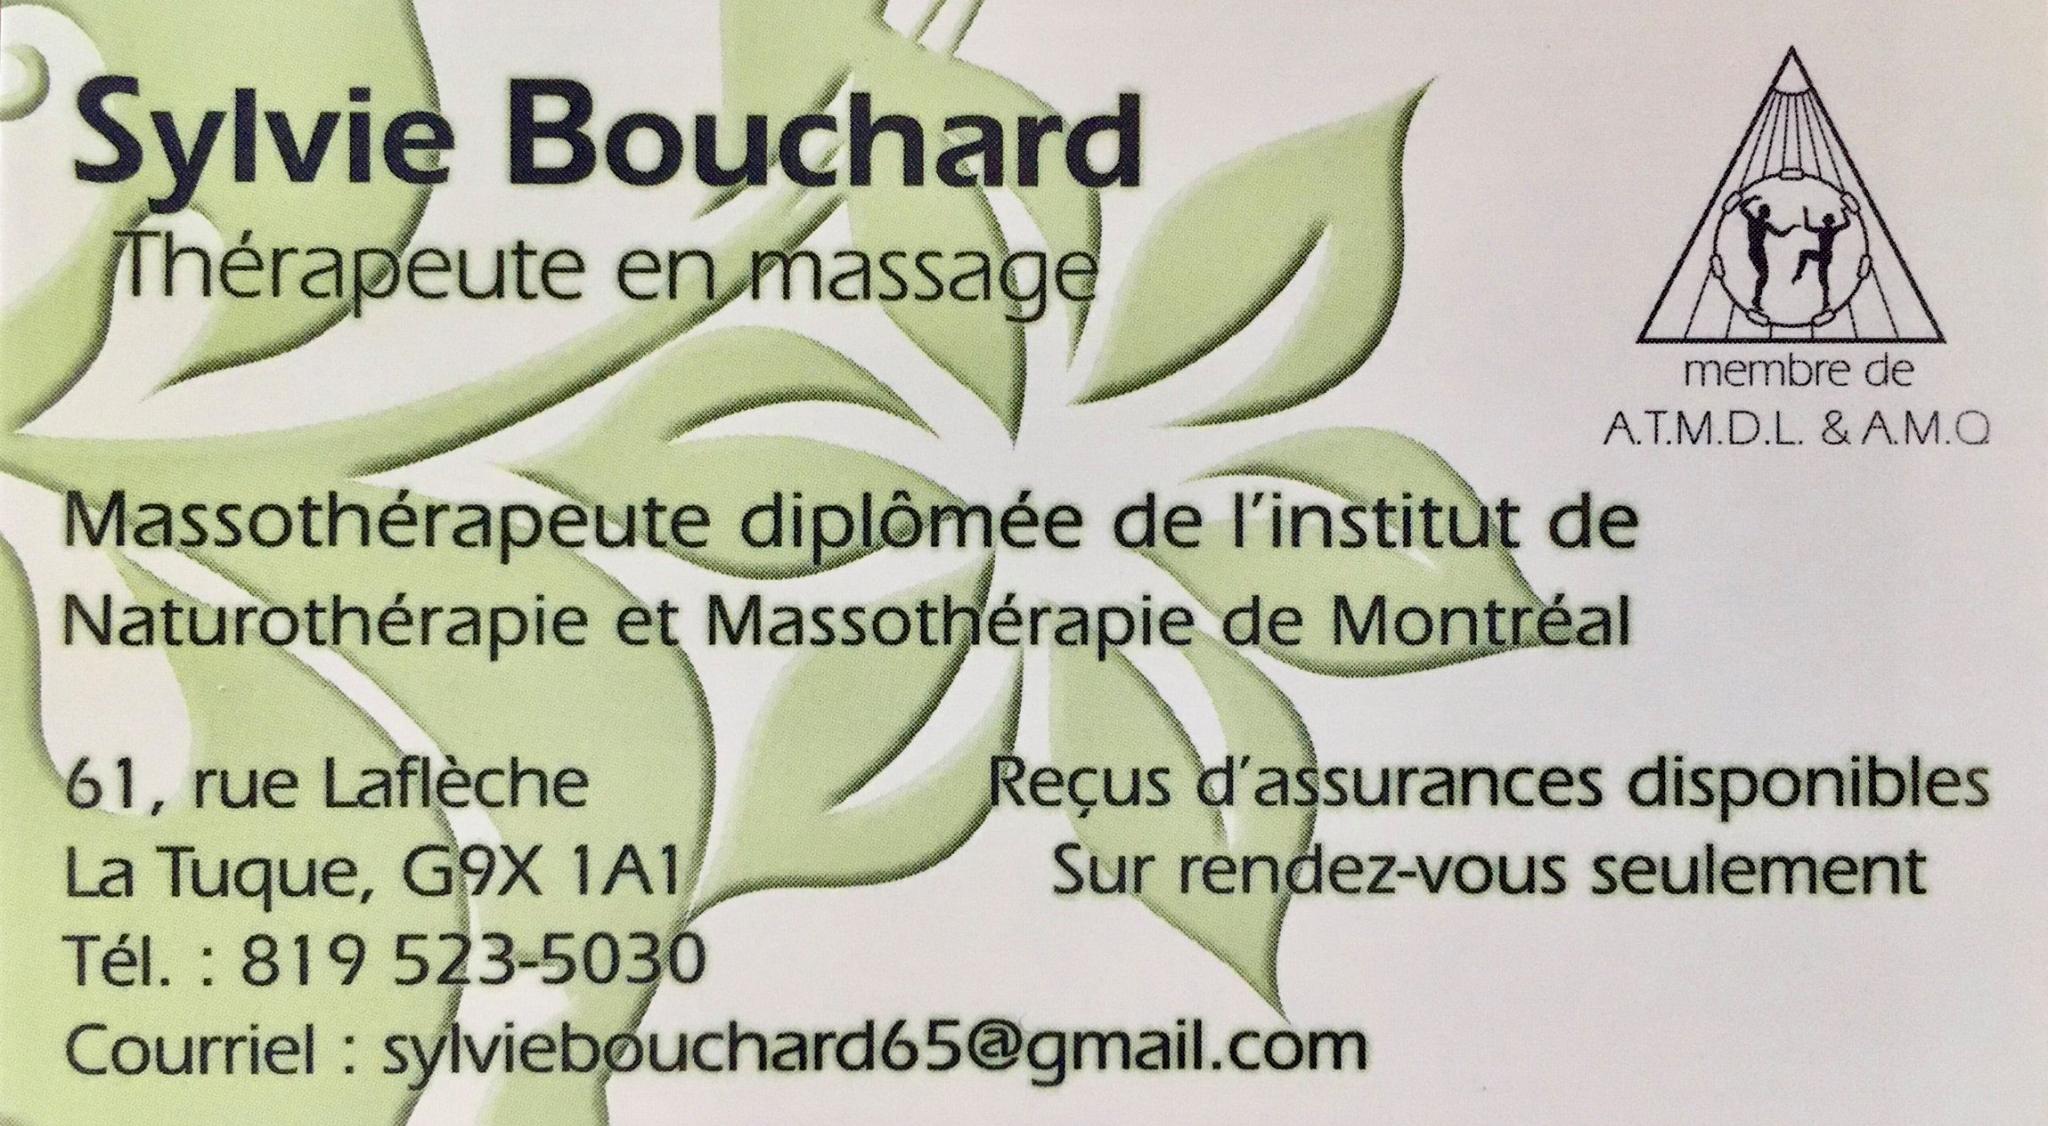 Sylvie Bouchard, massothérapeute